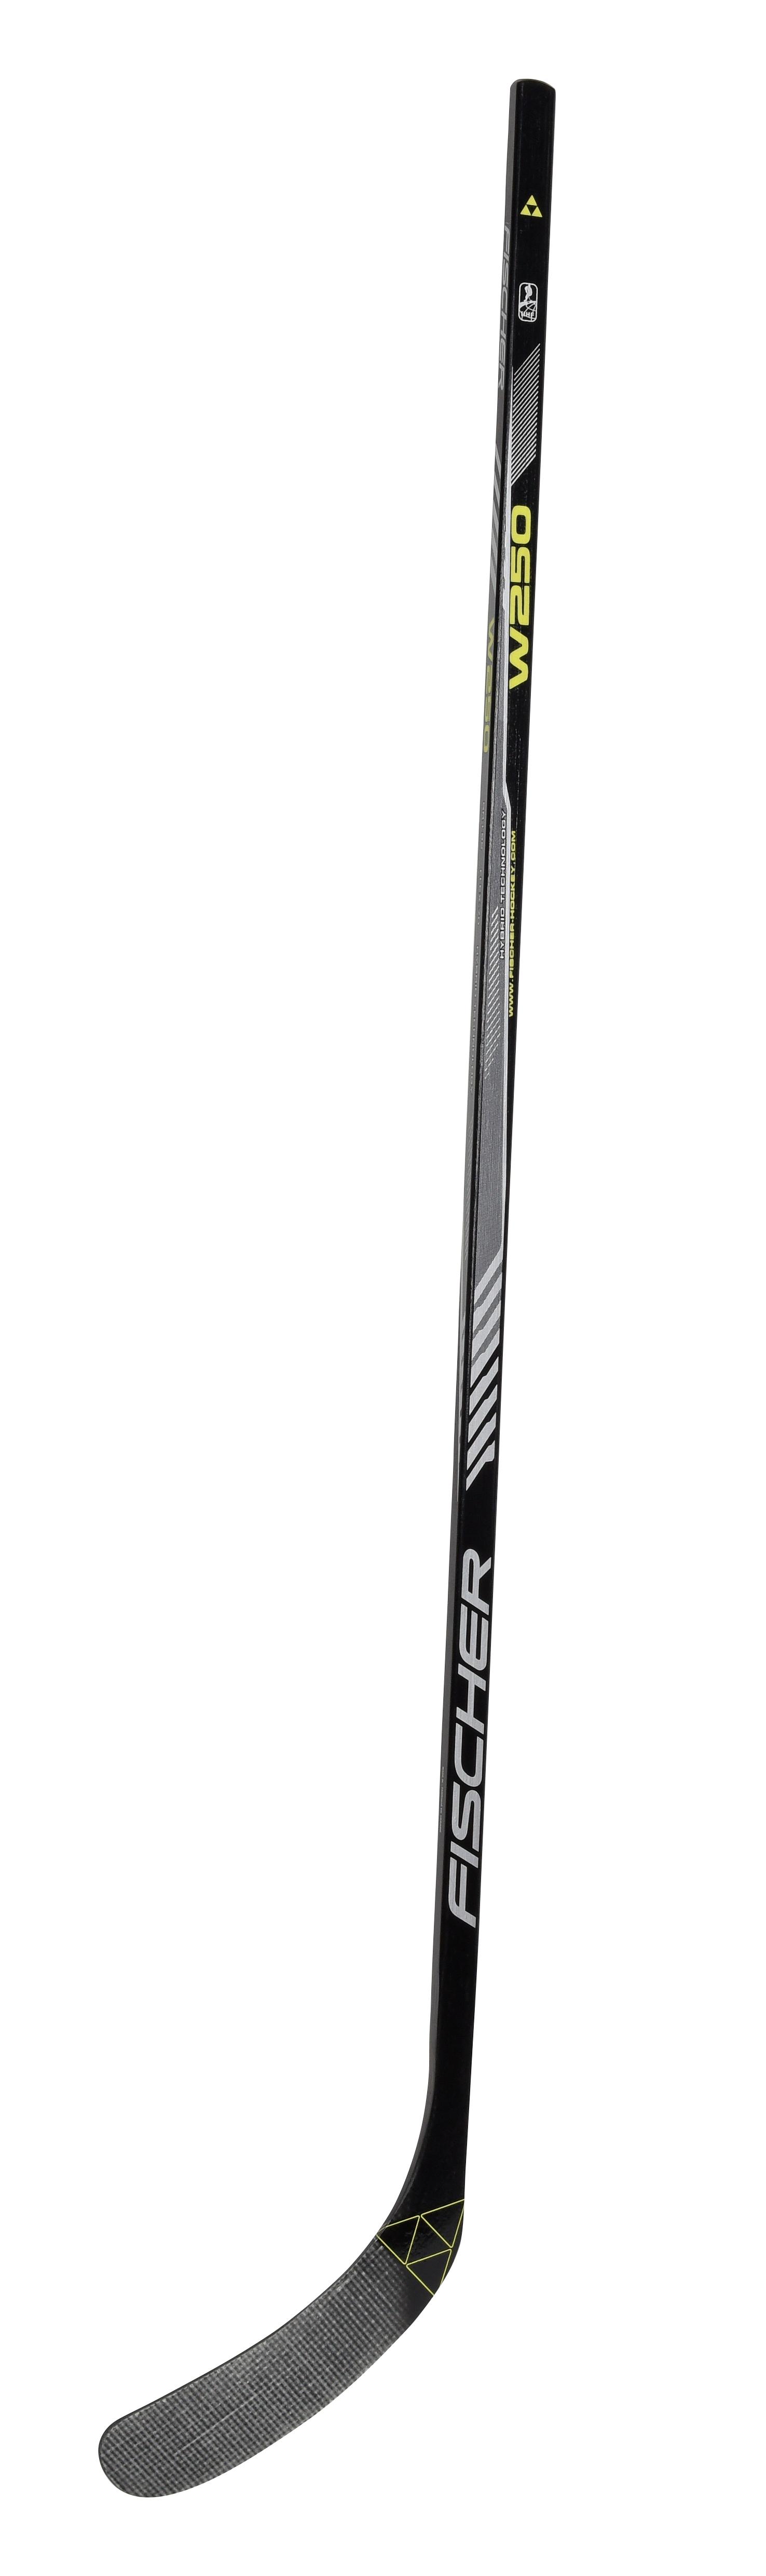 Hokejka FISCHER W250 JR